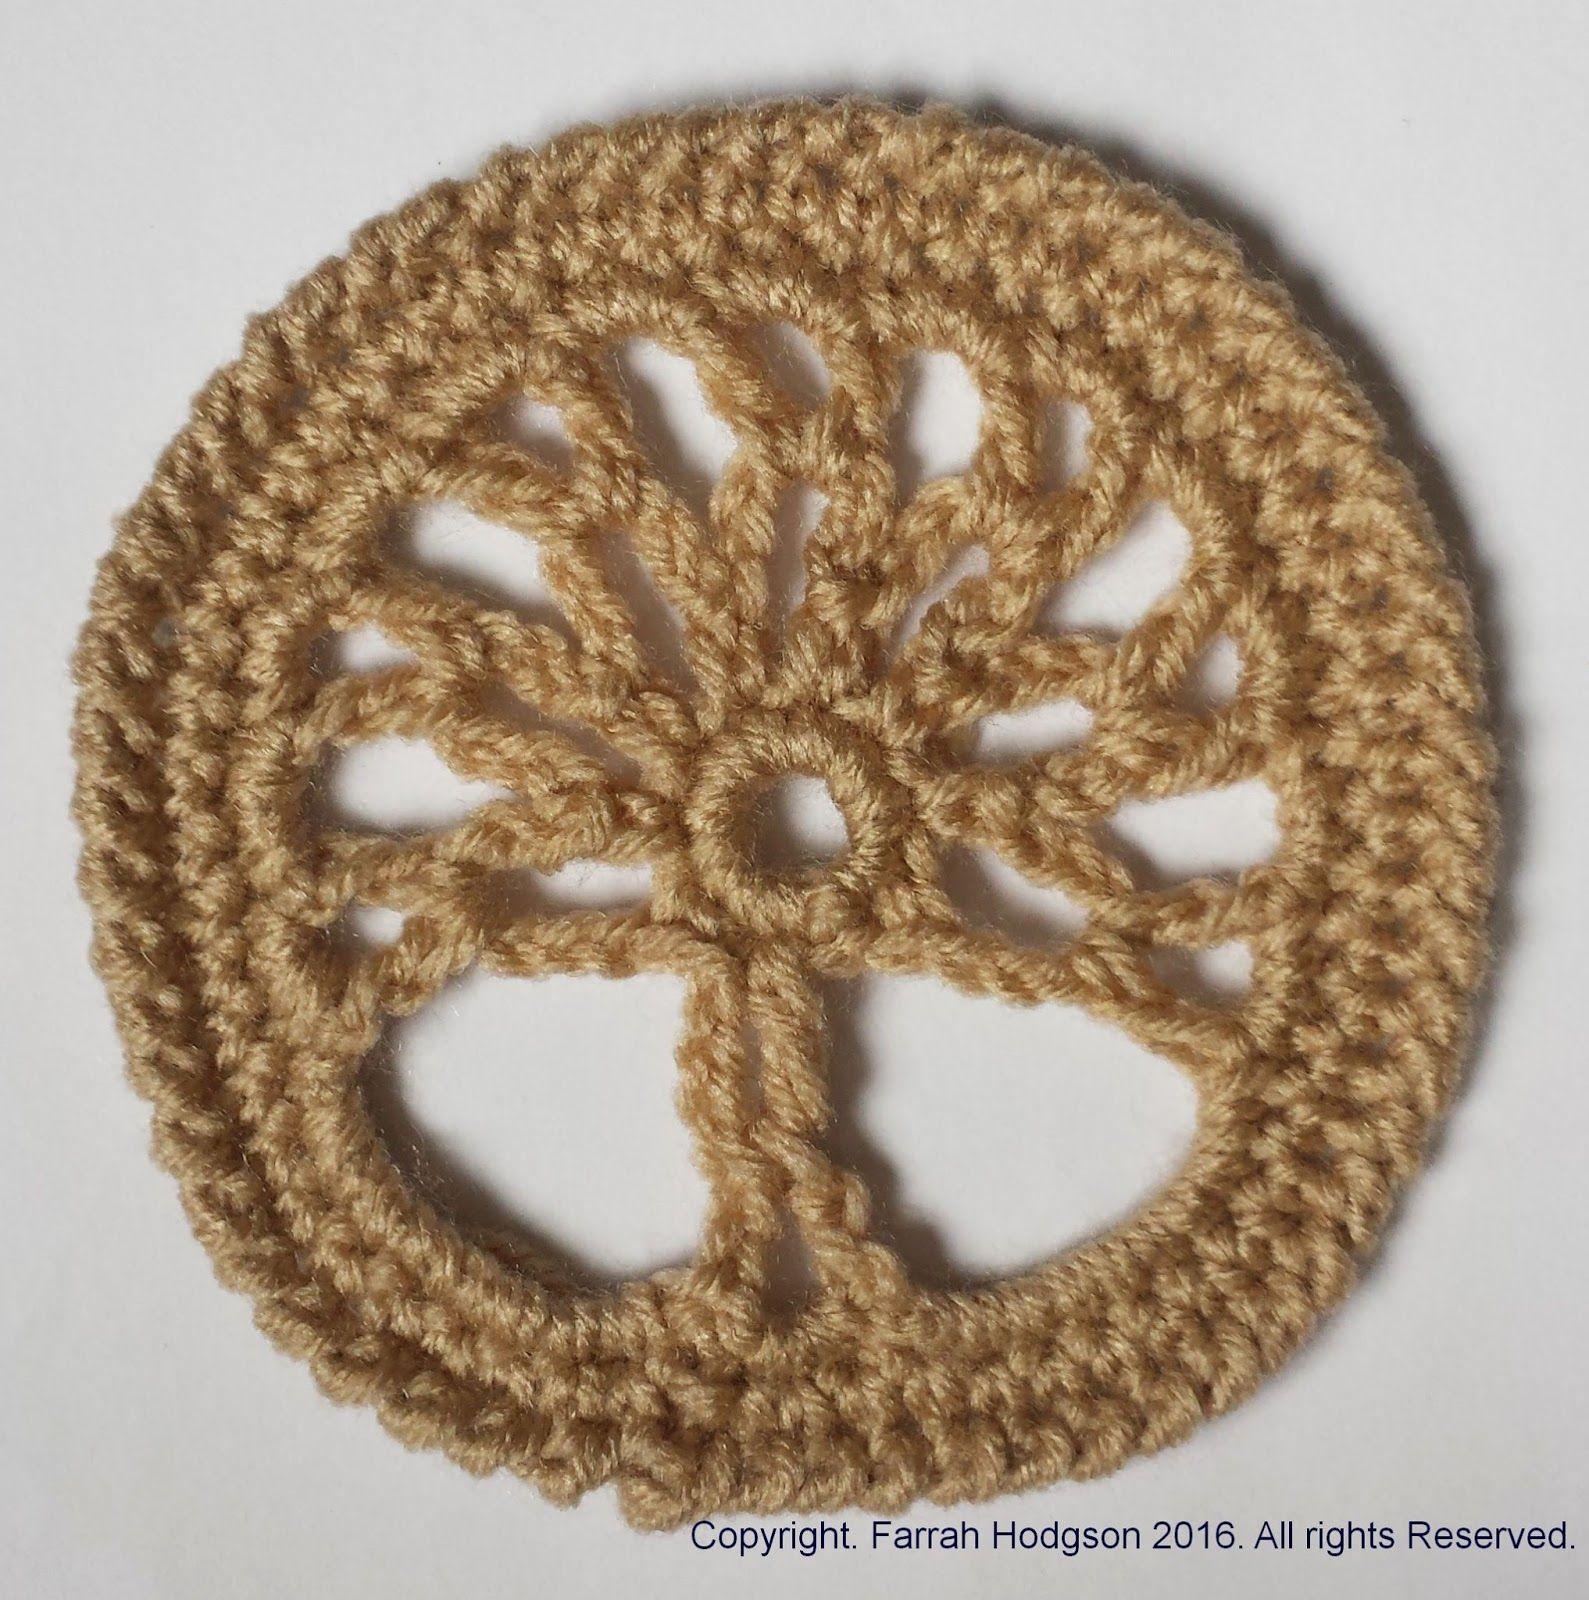 365 Crochet!: Tree of Life -free crochet pattern- | Madness crochet ...